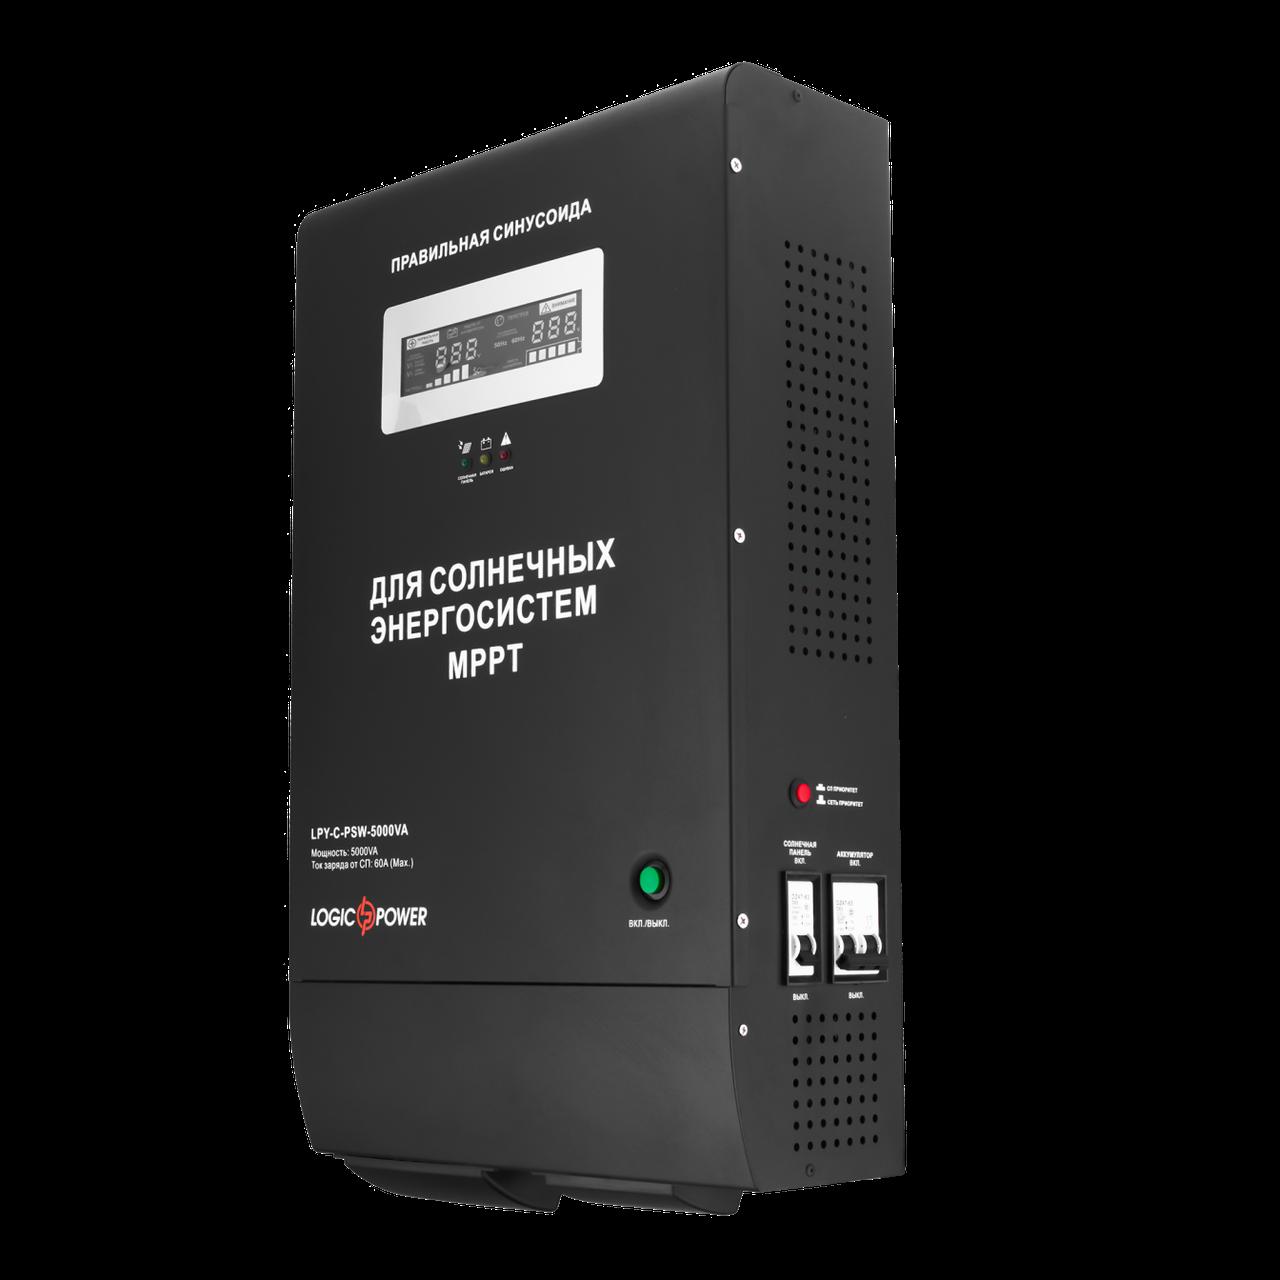 LogicPower LPY-С-PSW-5000VA (3500W) MPPT 48V